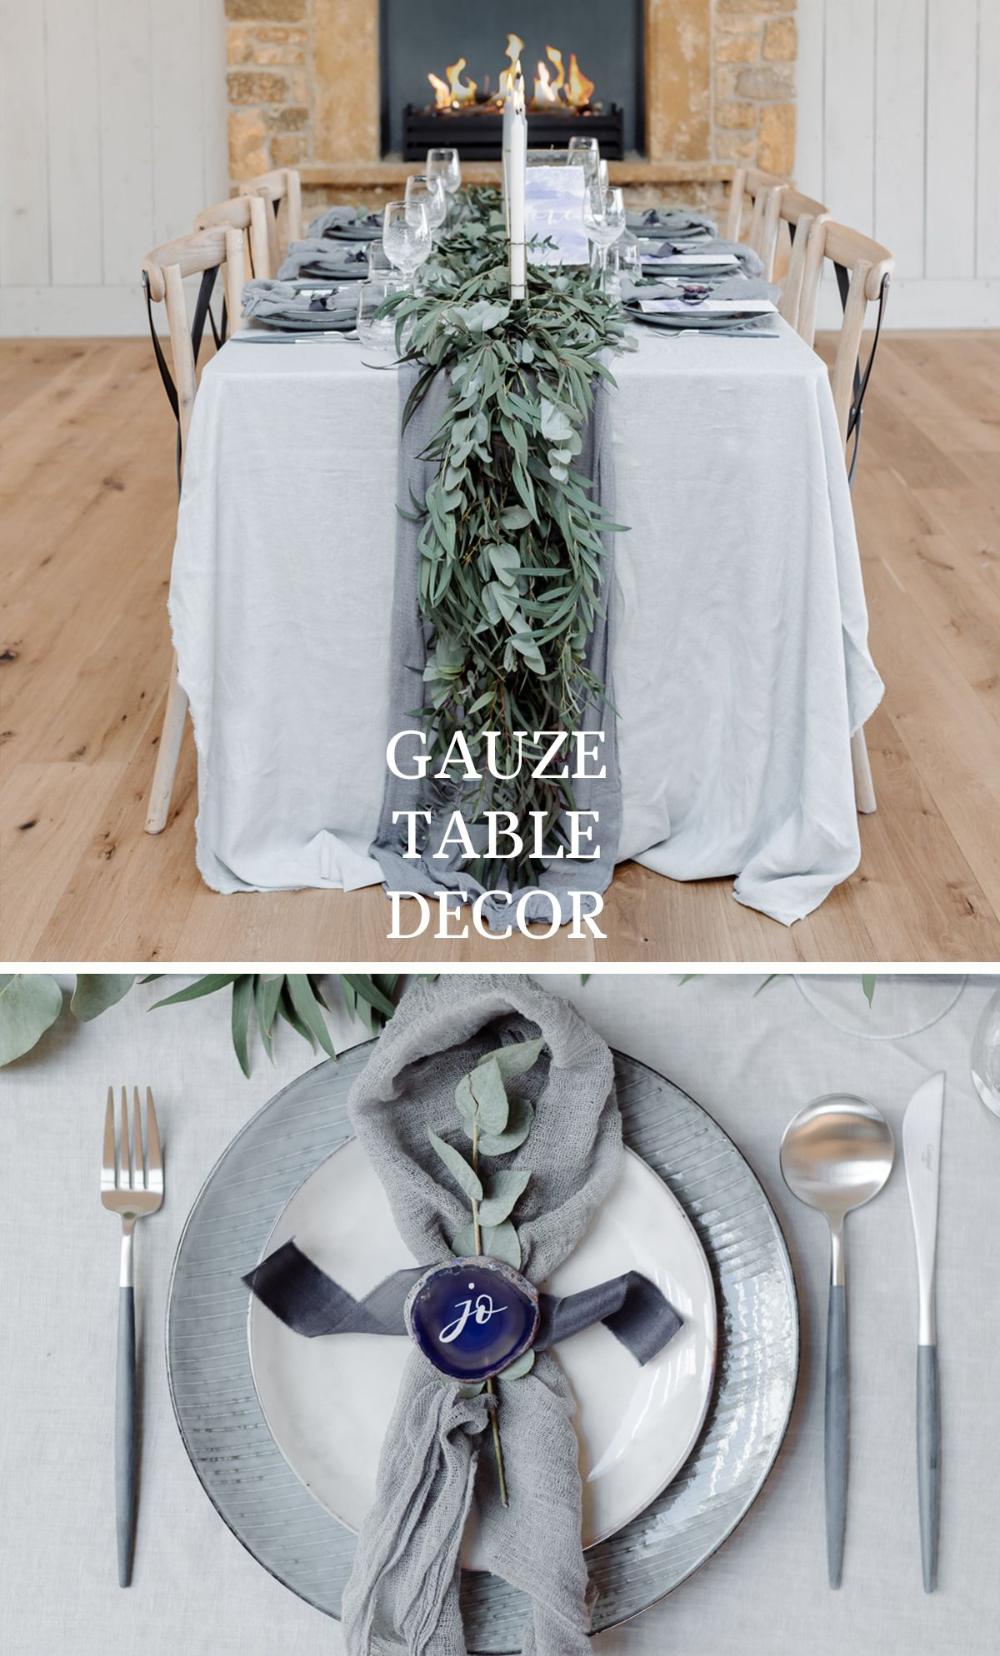 Wood Table Gauze Runner Grey Chargers Google Search In 2020 Table Runners Wedding Wedding Table Flowers Wedding Table